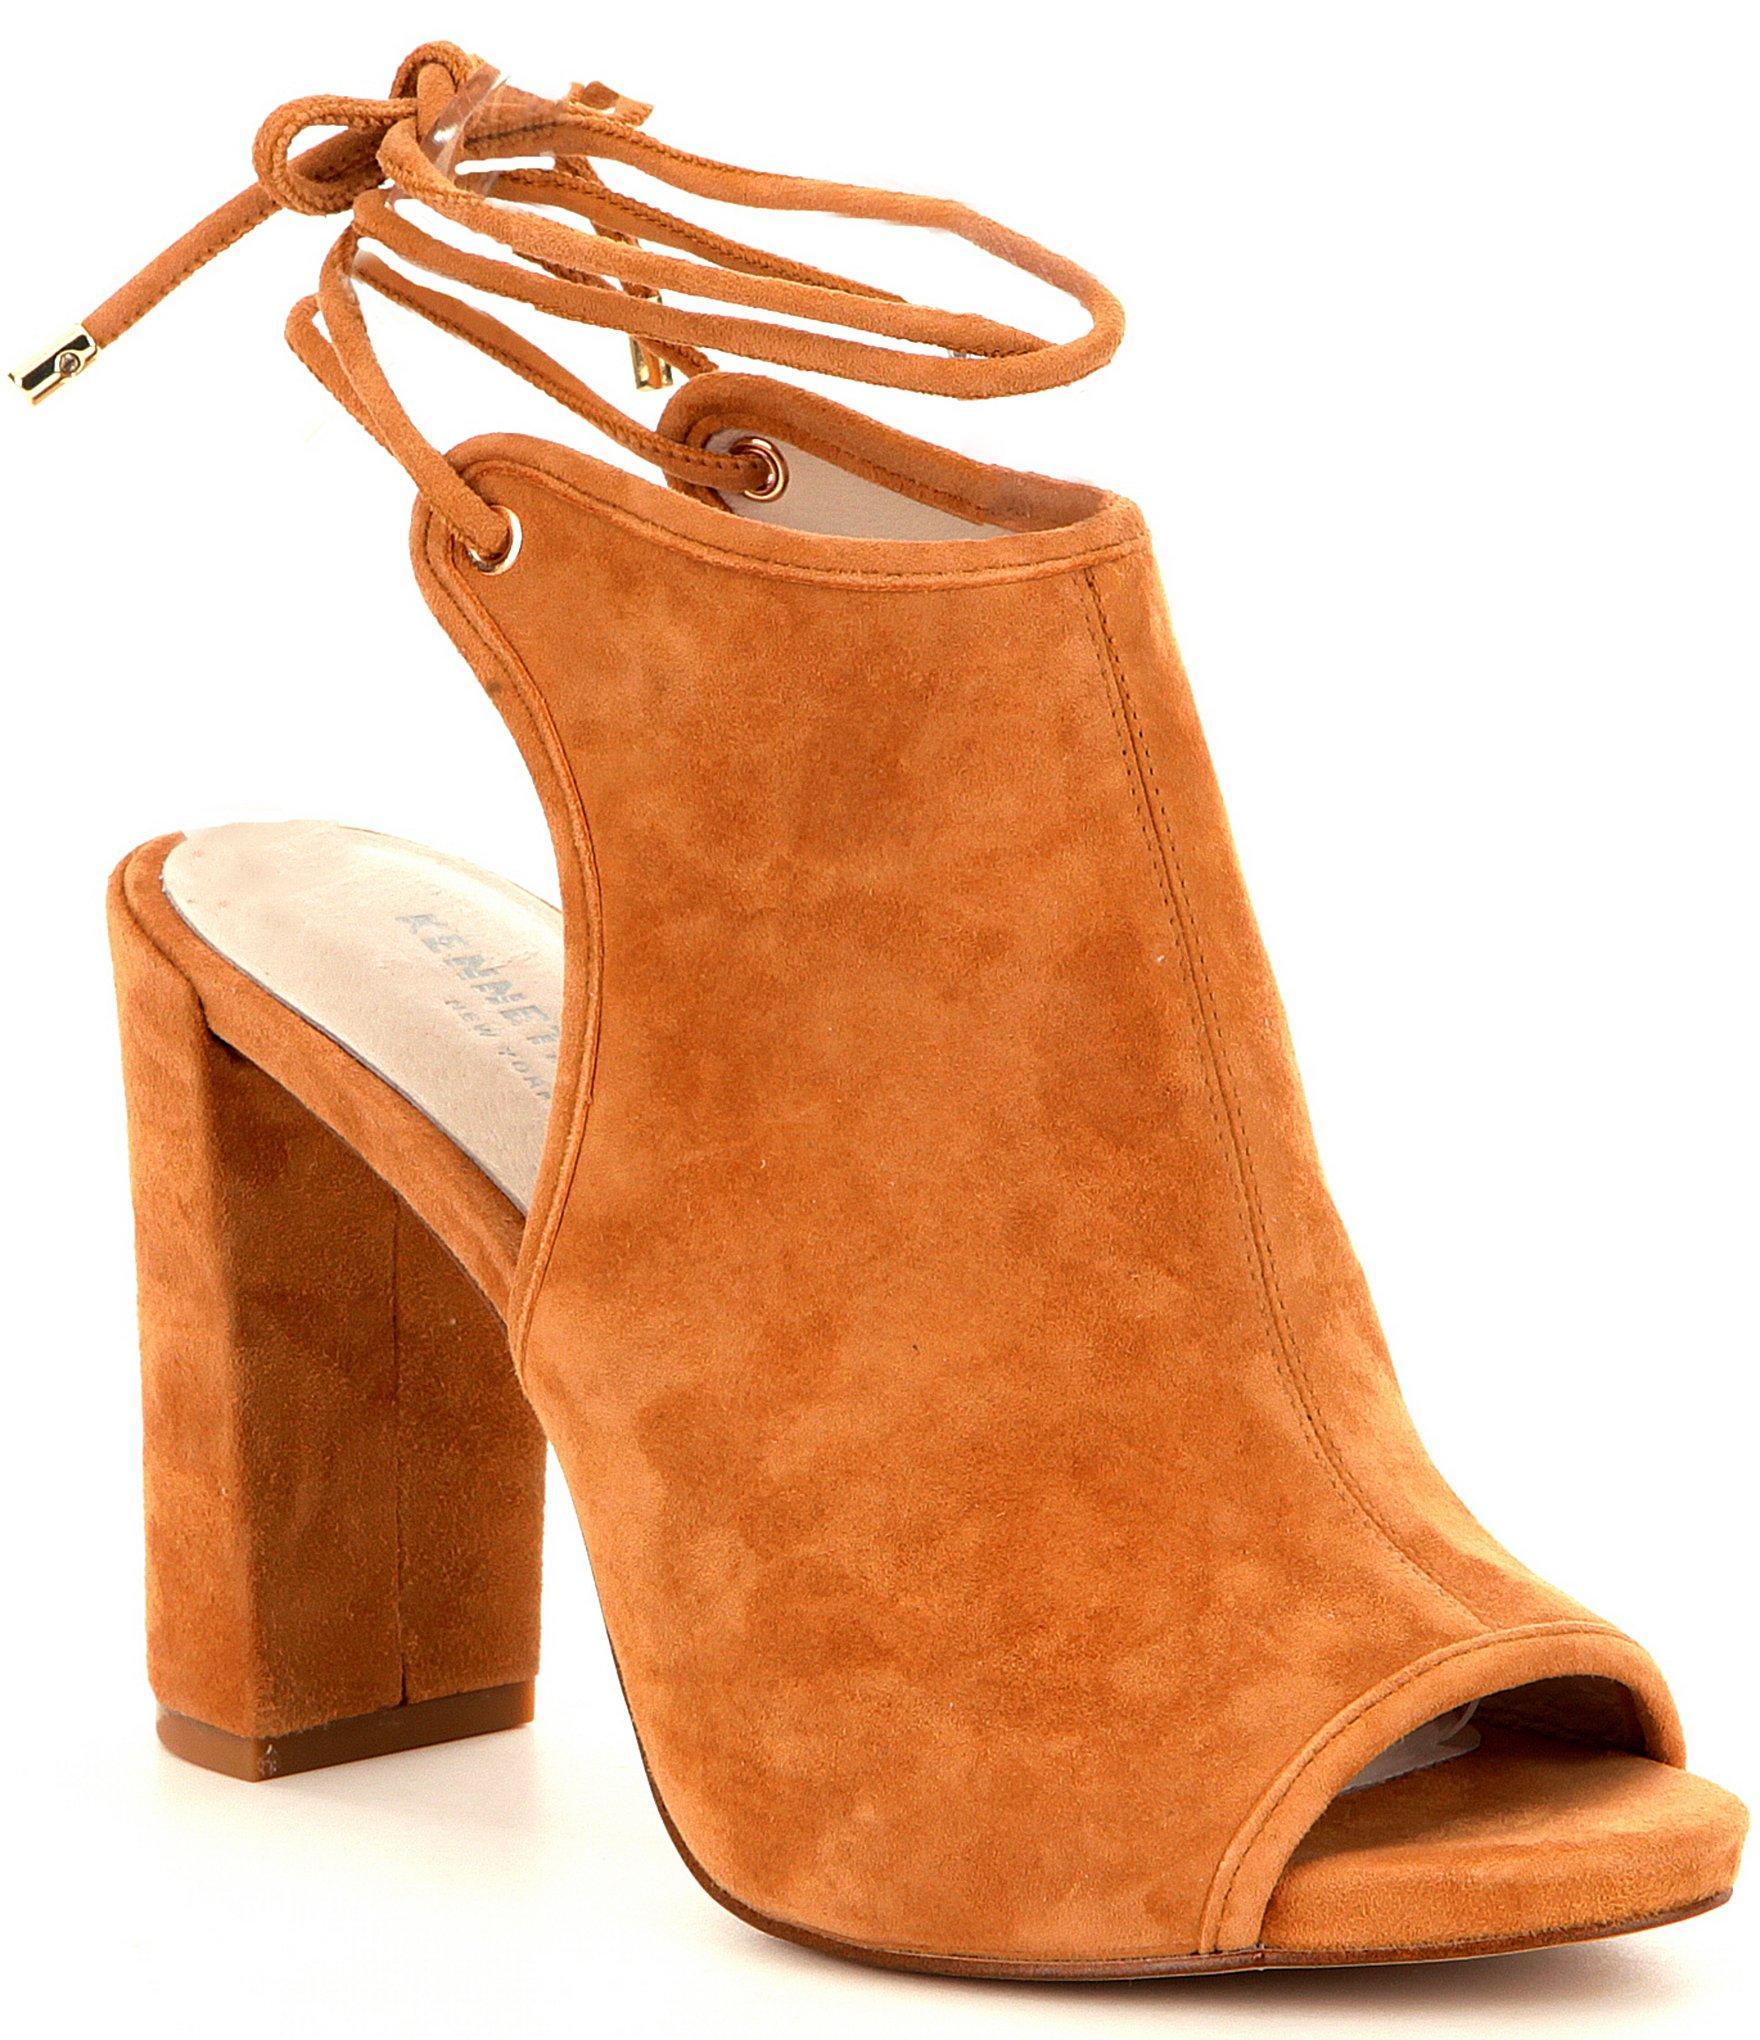 Kenneth Cole New York Darla Block Heel Sandal sIYhU